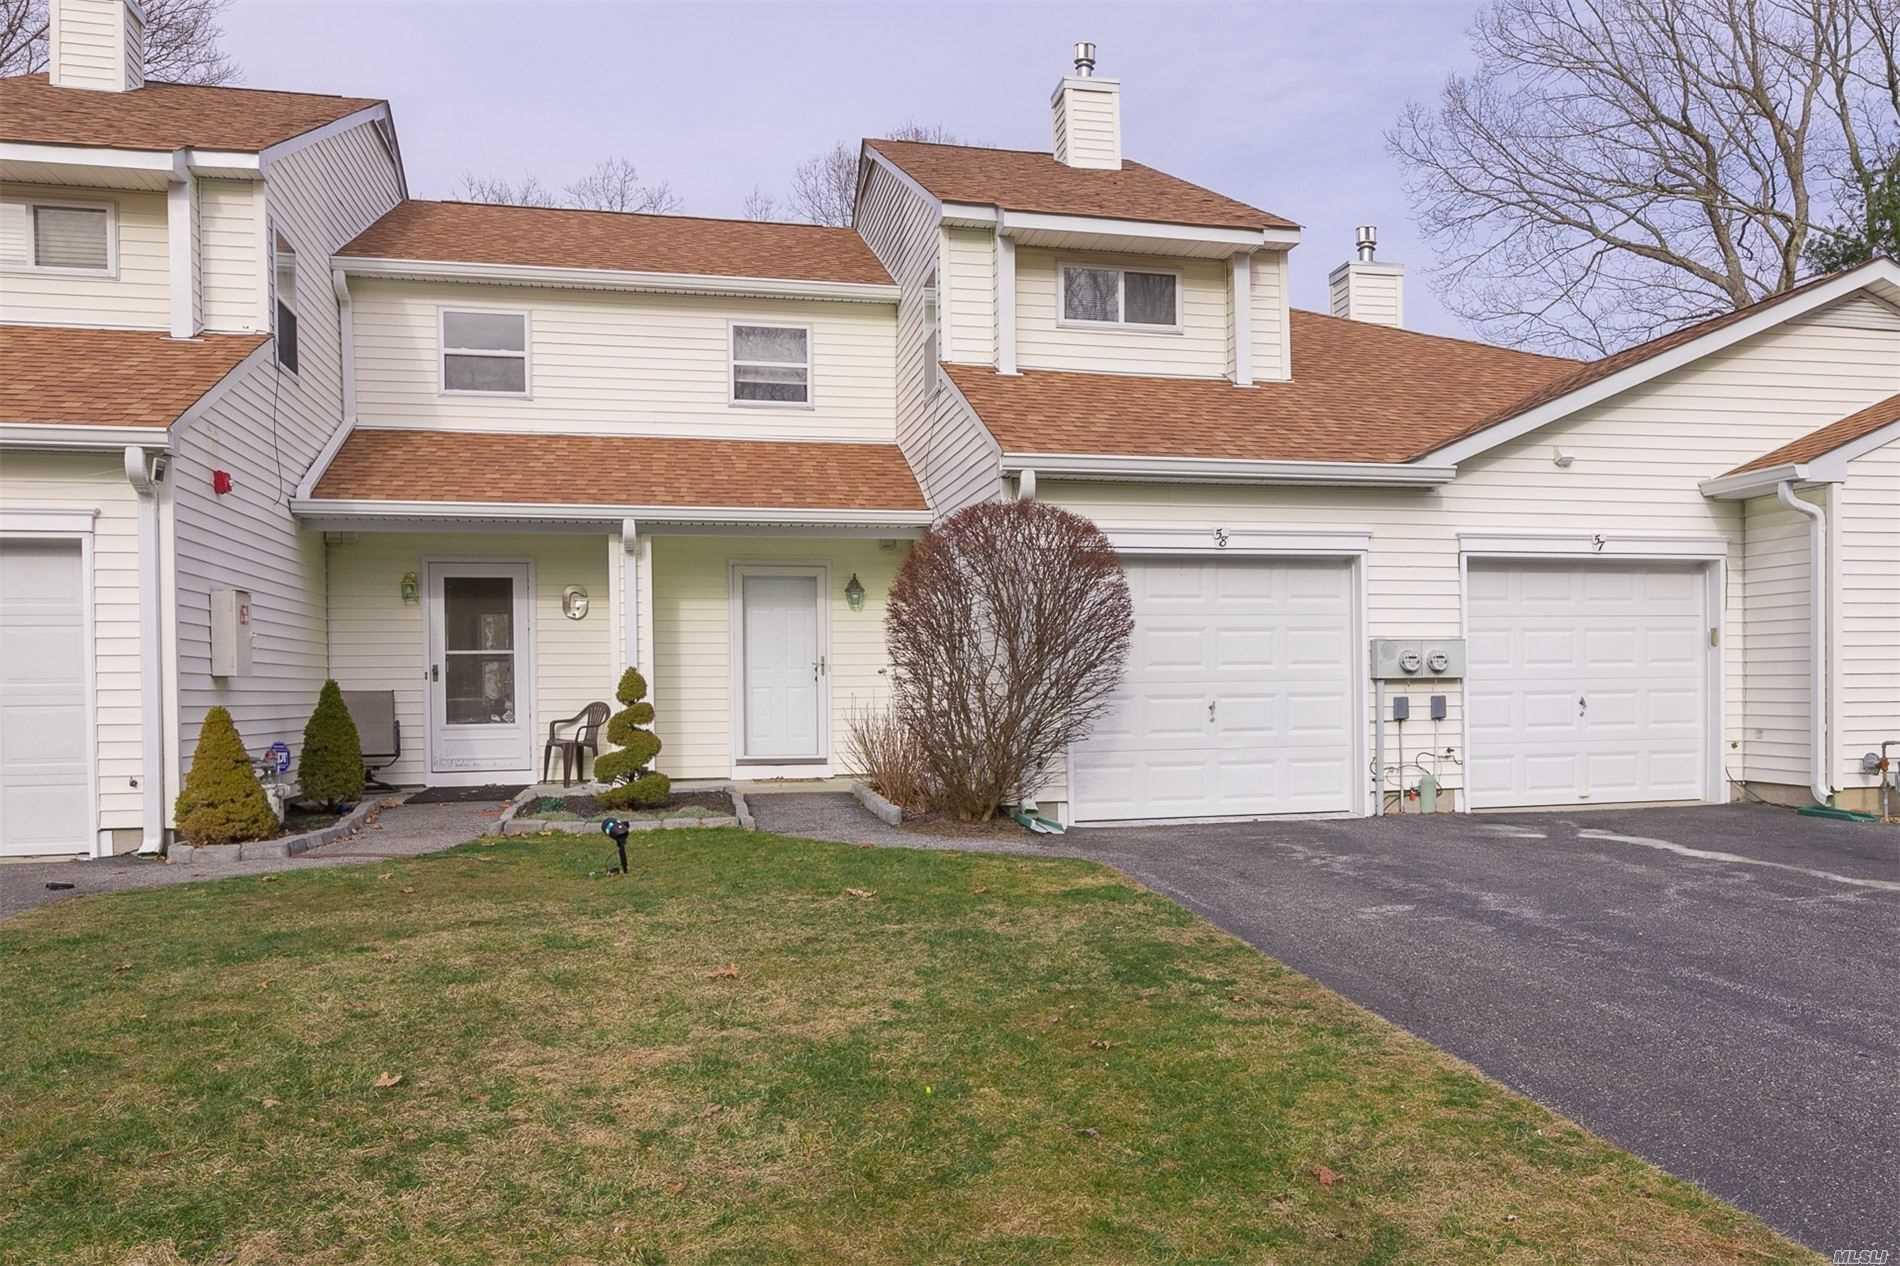 Property for sale at 58 Cobbleridge Lane, Manorville NY 11949, Manorville,  New York 11949